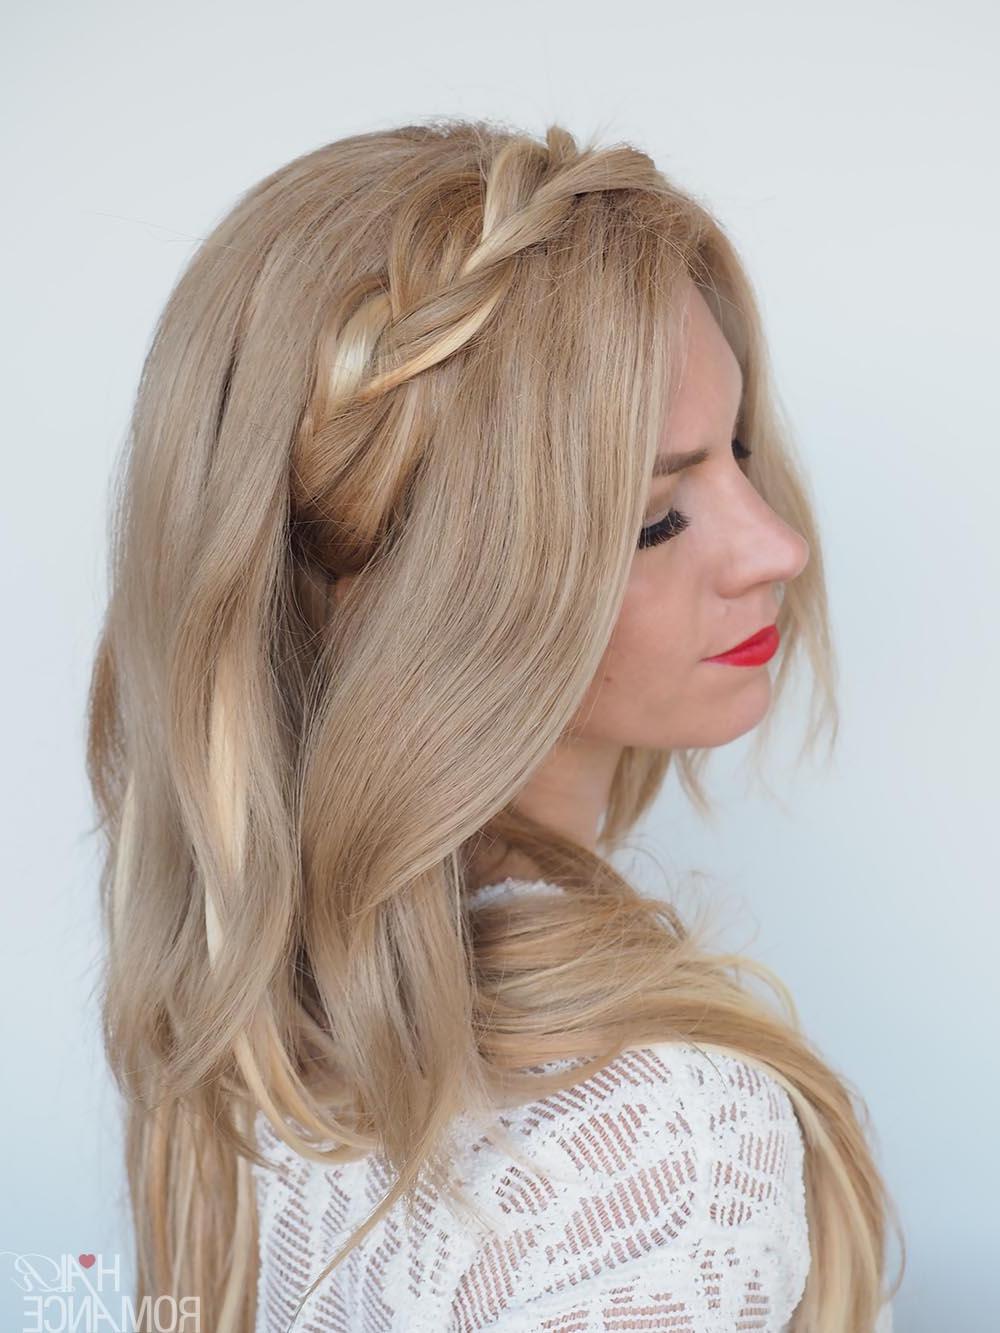 Popular Double Headband Braided Hairstyles With Flowers In Braided Headband Hairstyle Tutorial – Hair Romance (Gallery 7 of 20)